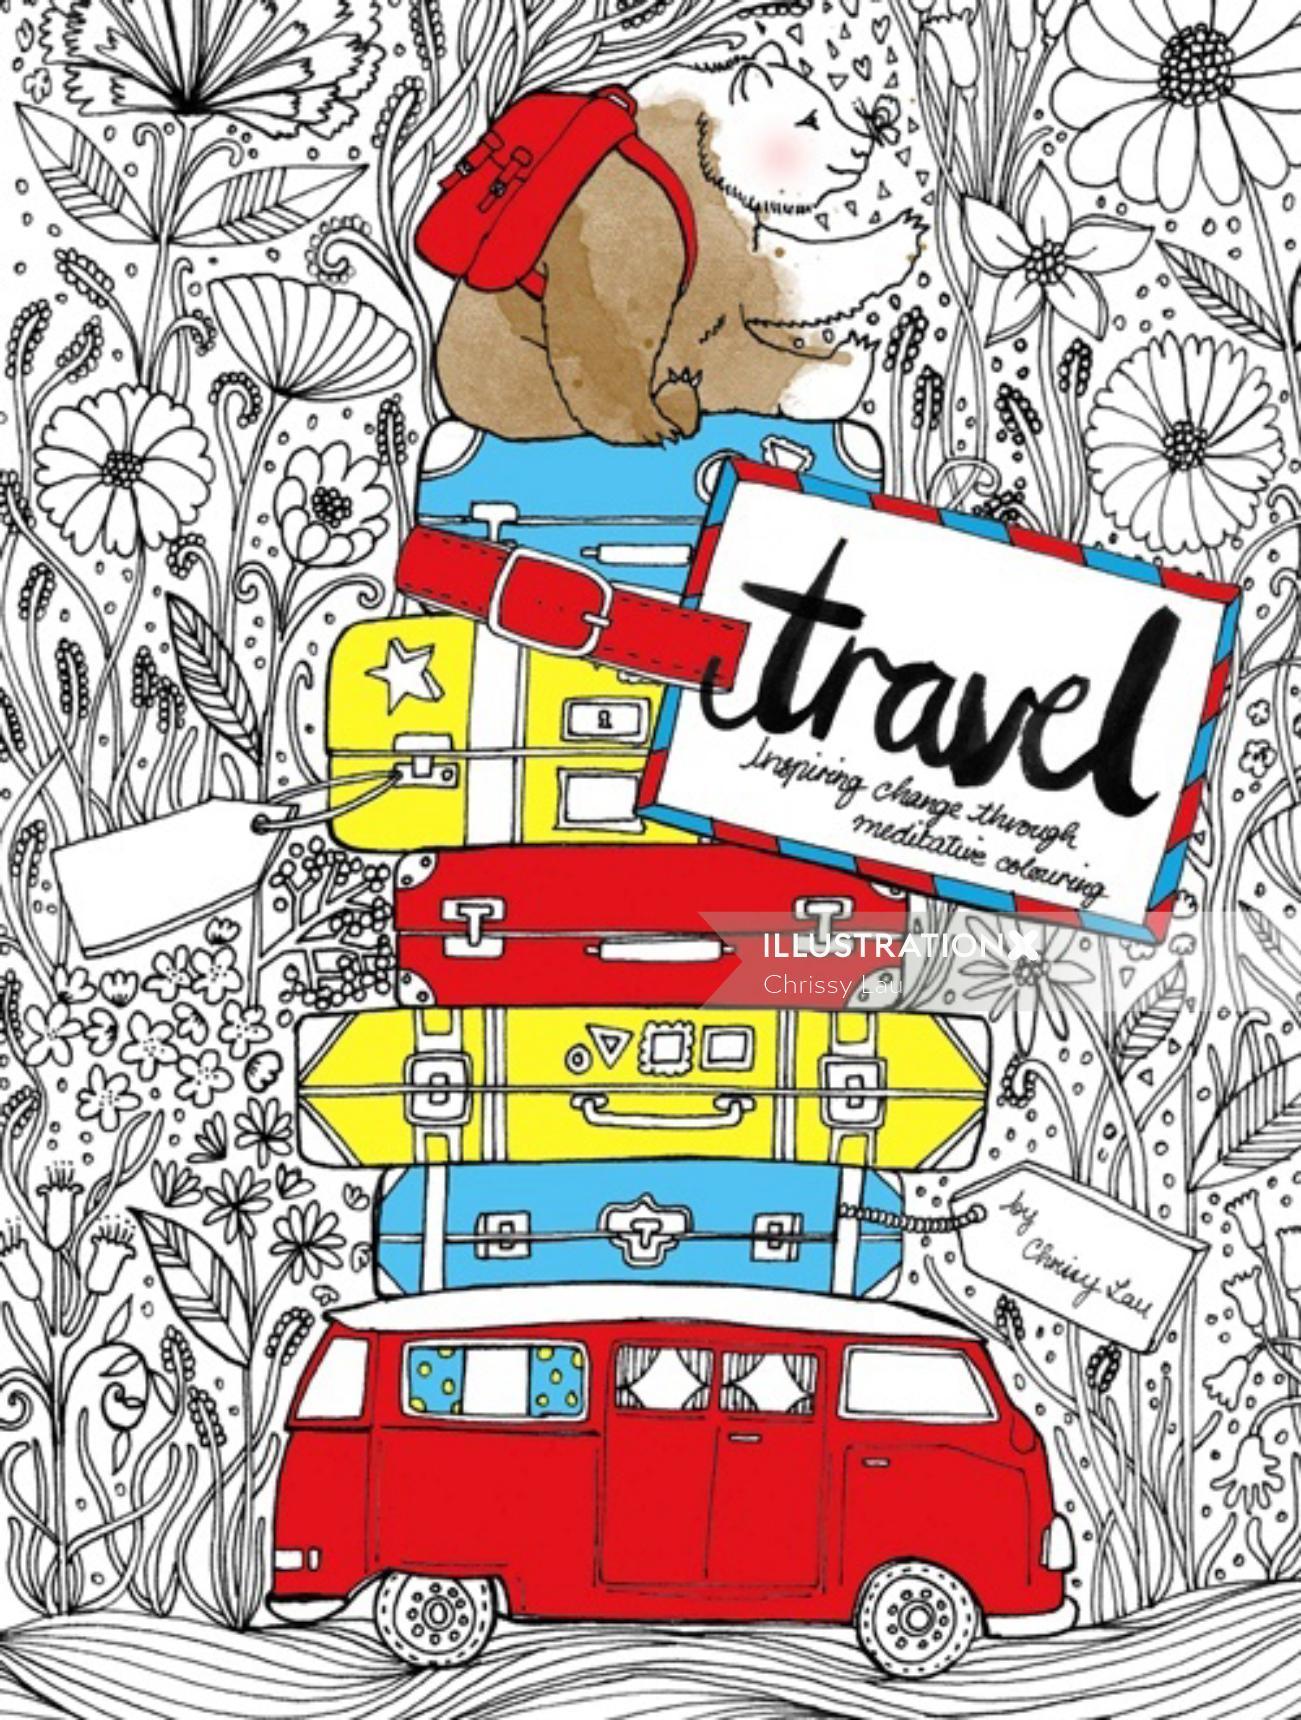 Lifestyle illustration of travel